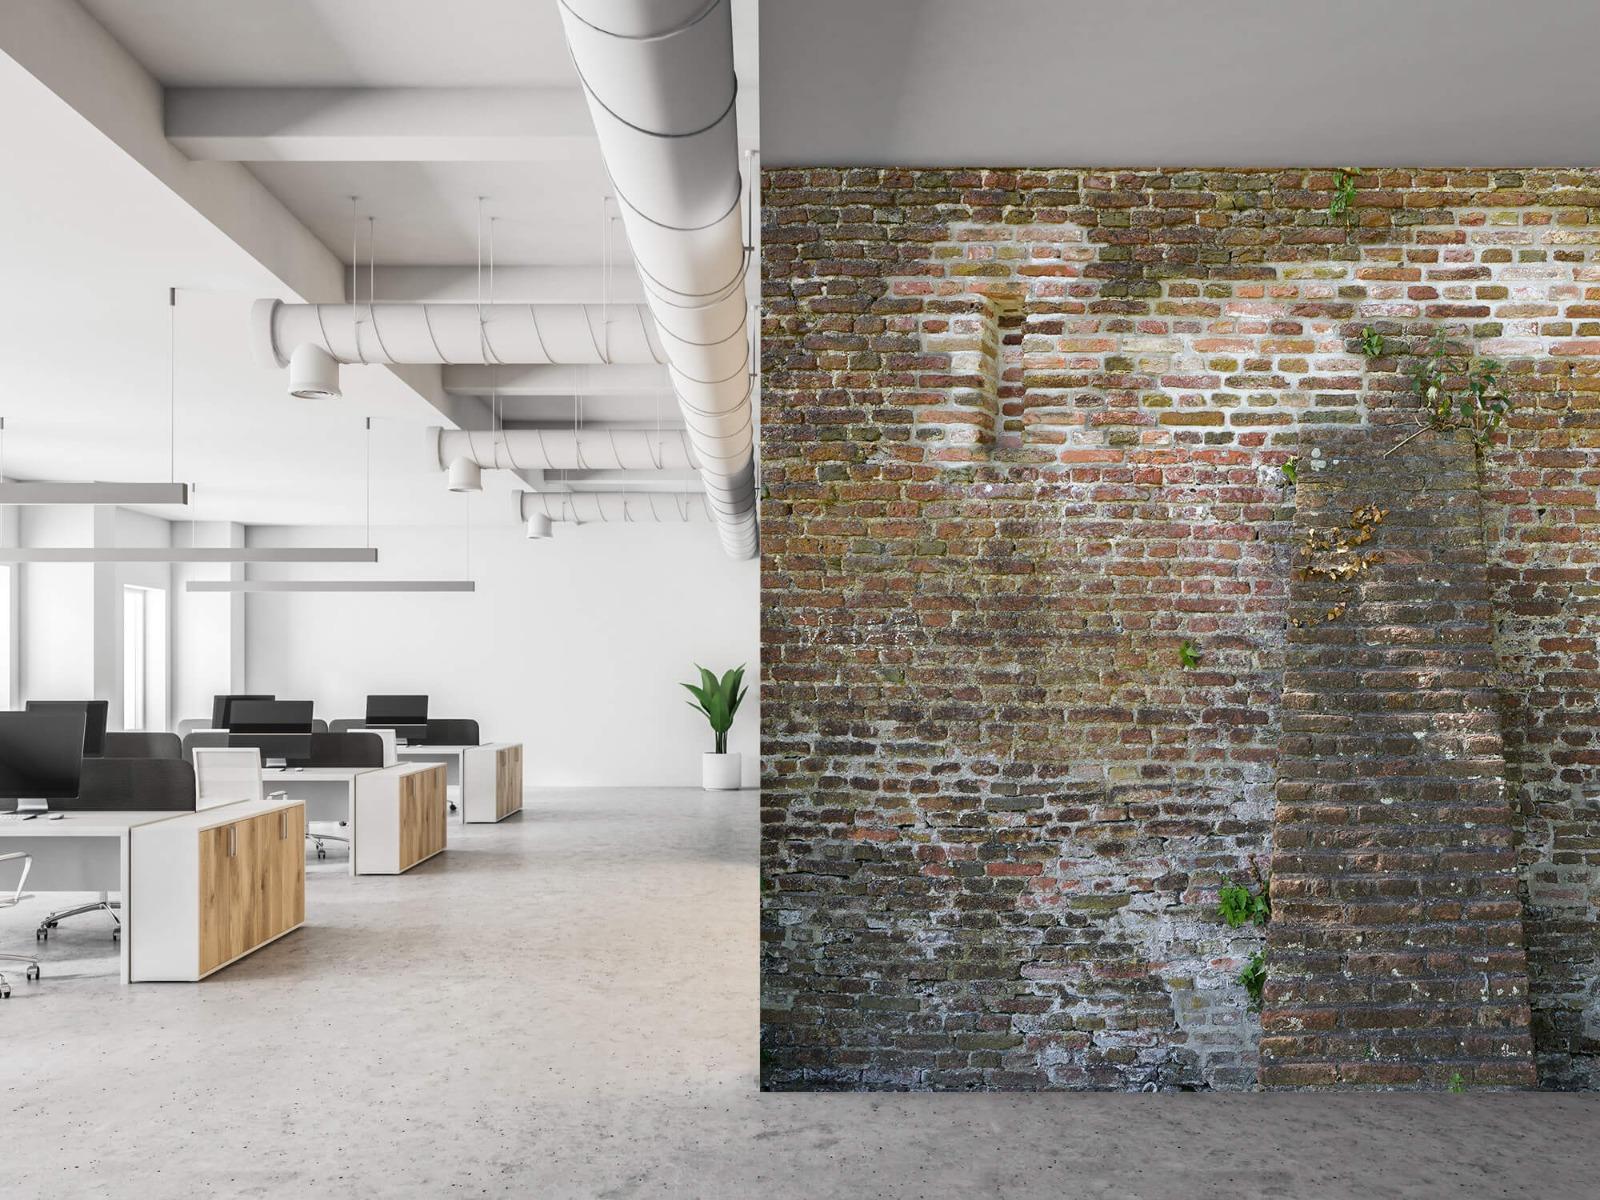 Stenen - Verweerde stadsmuur 21